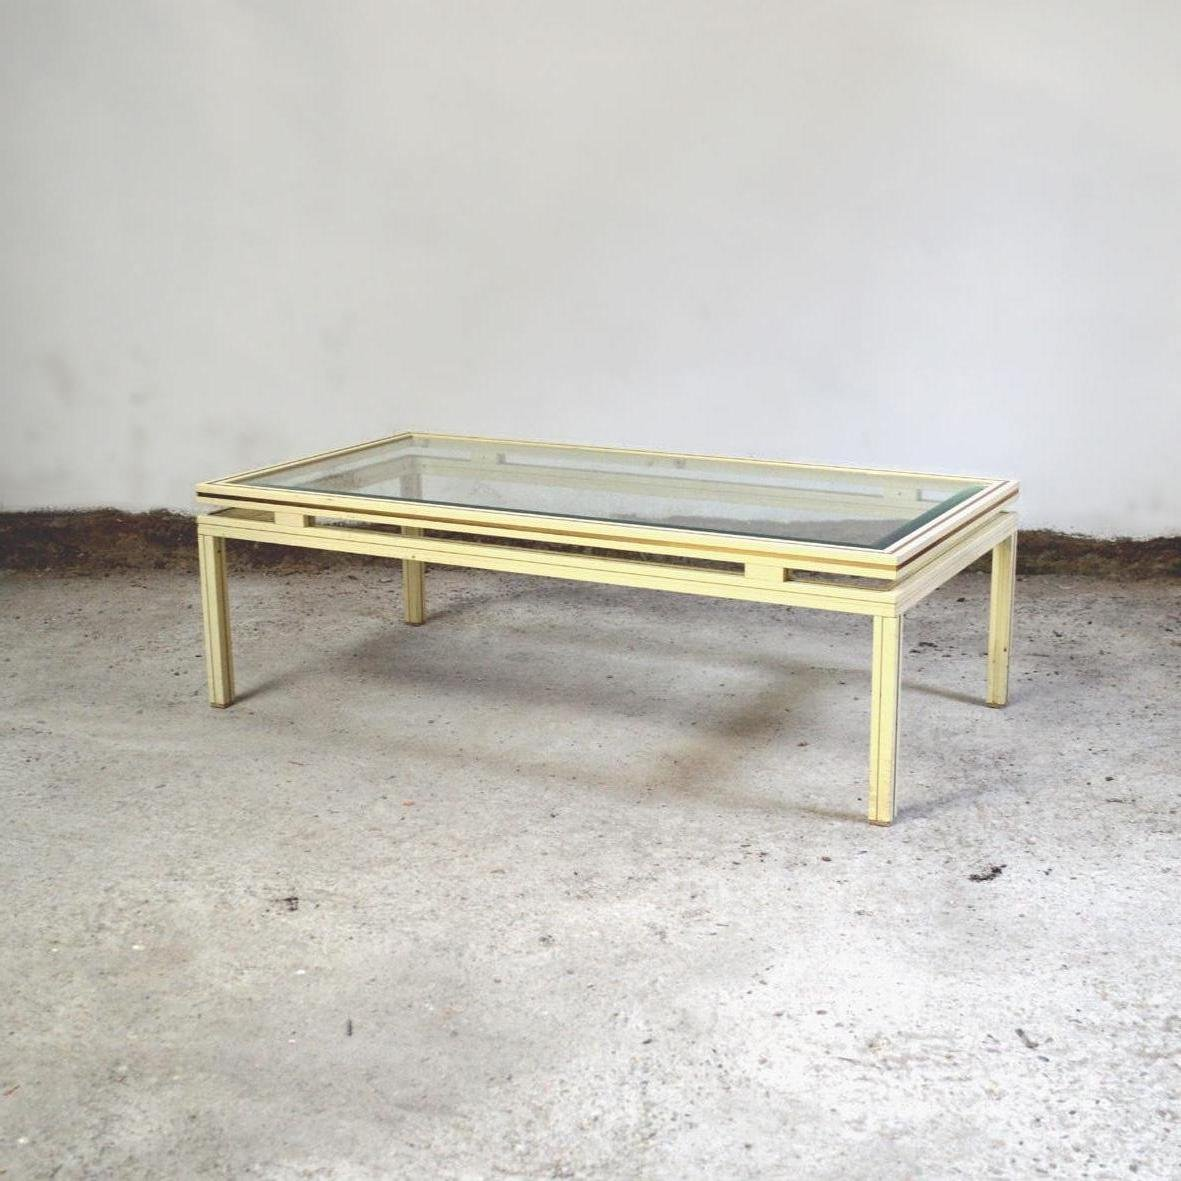 table basse par pierre vandel 1970s en vente sur pamono. Black Bedroom Furniture Sets. Home Design Ideas